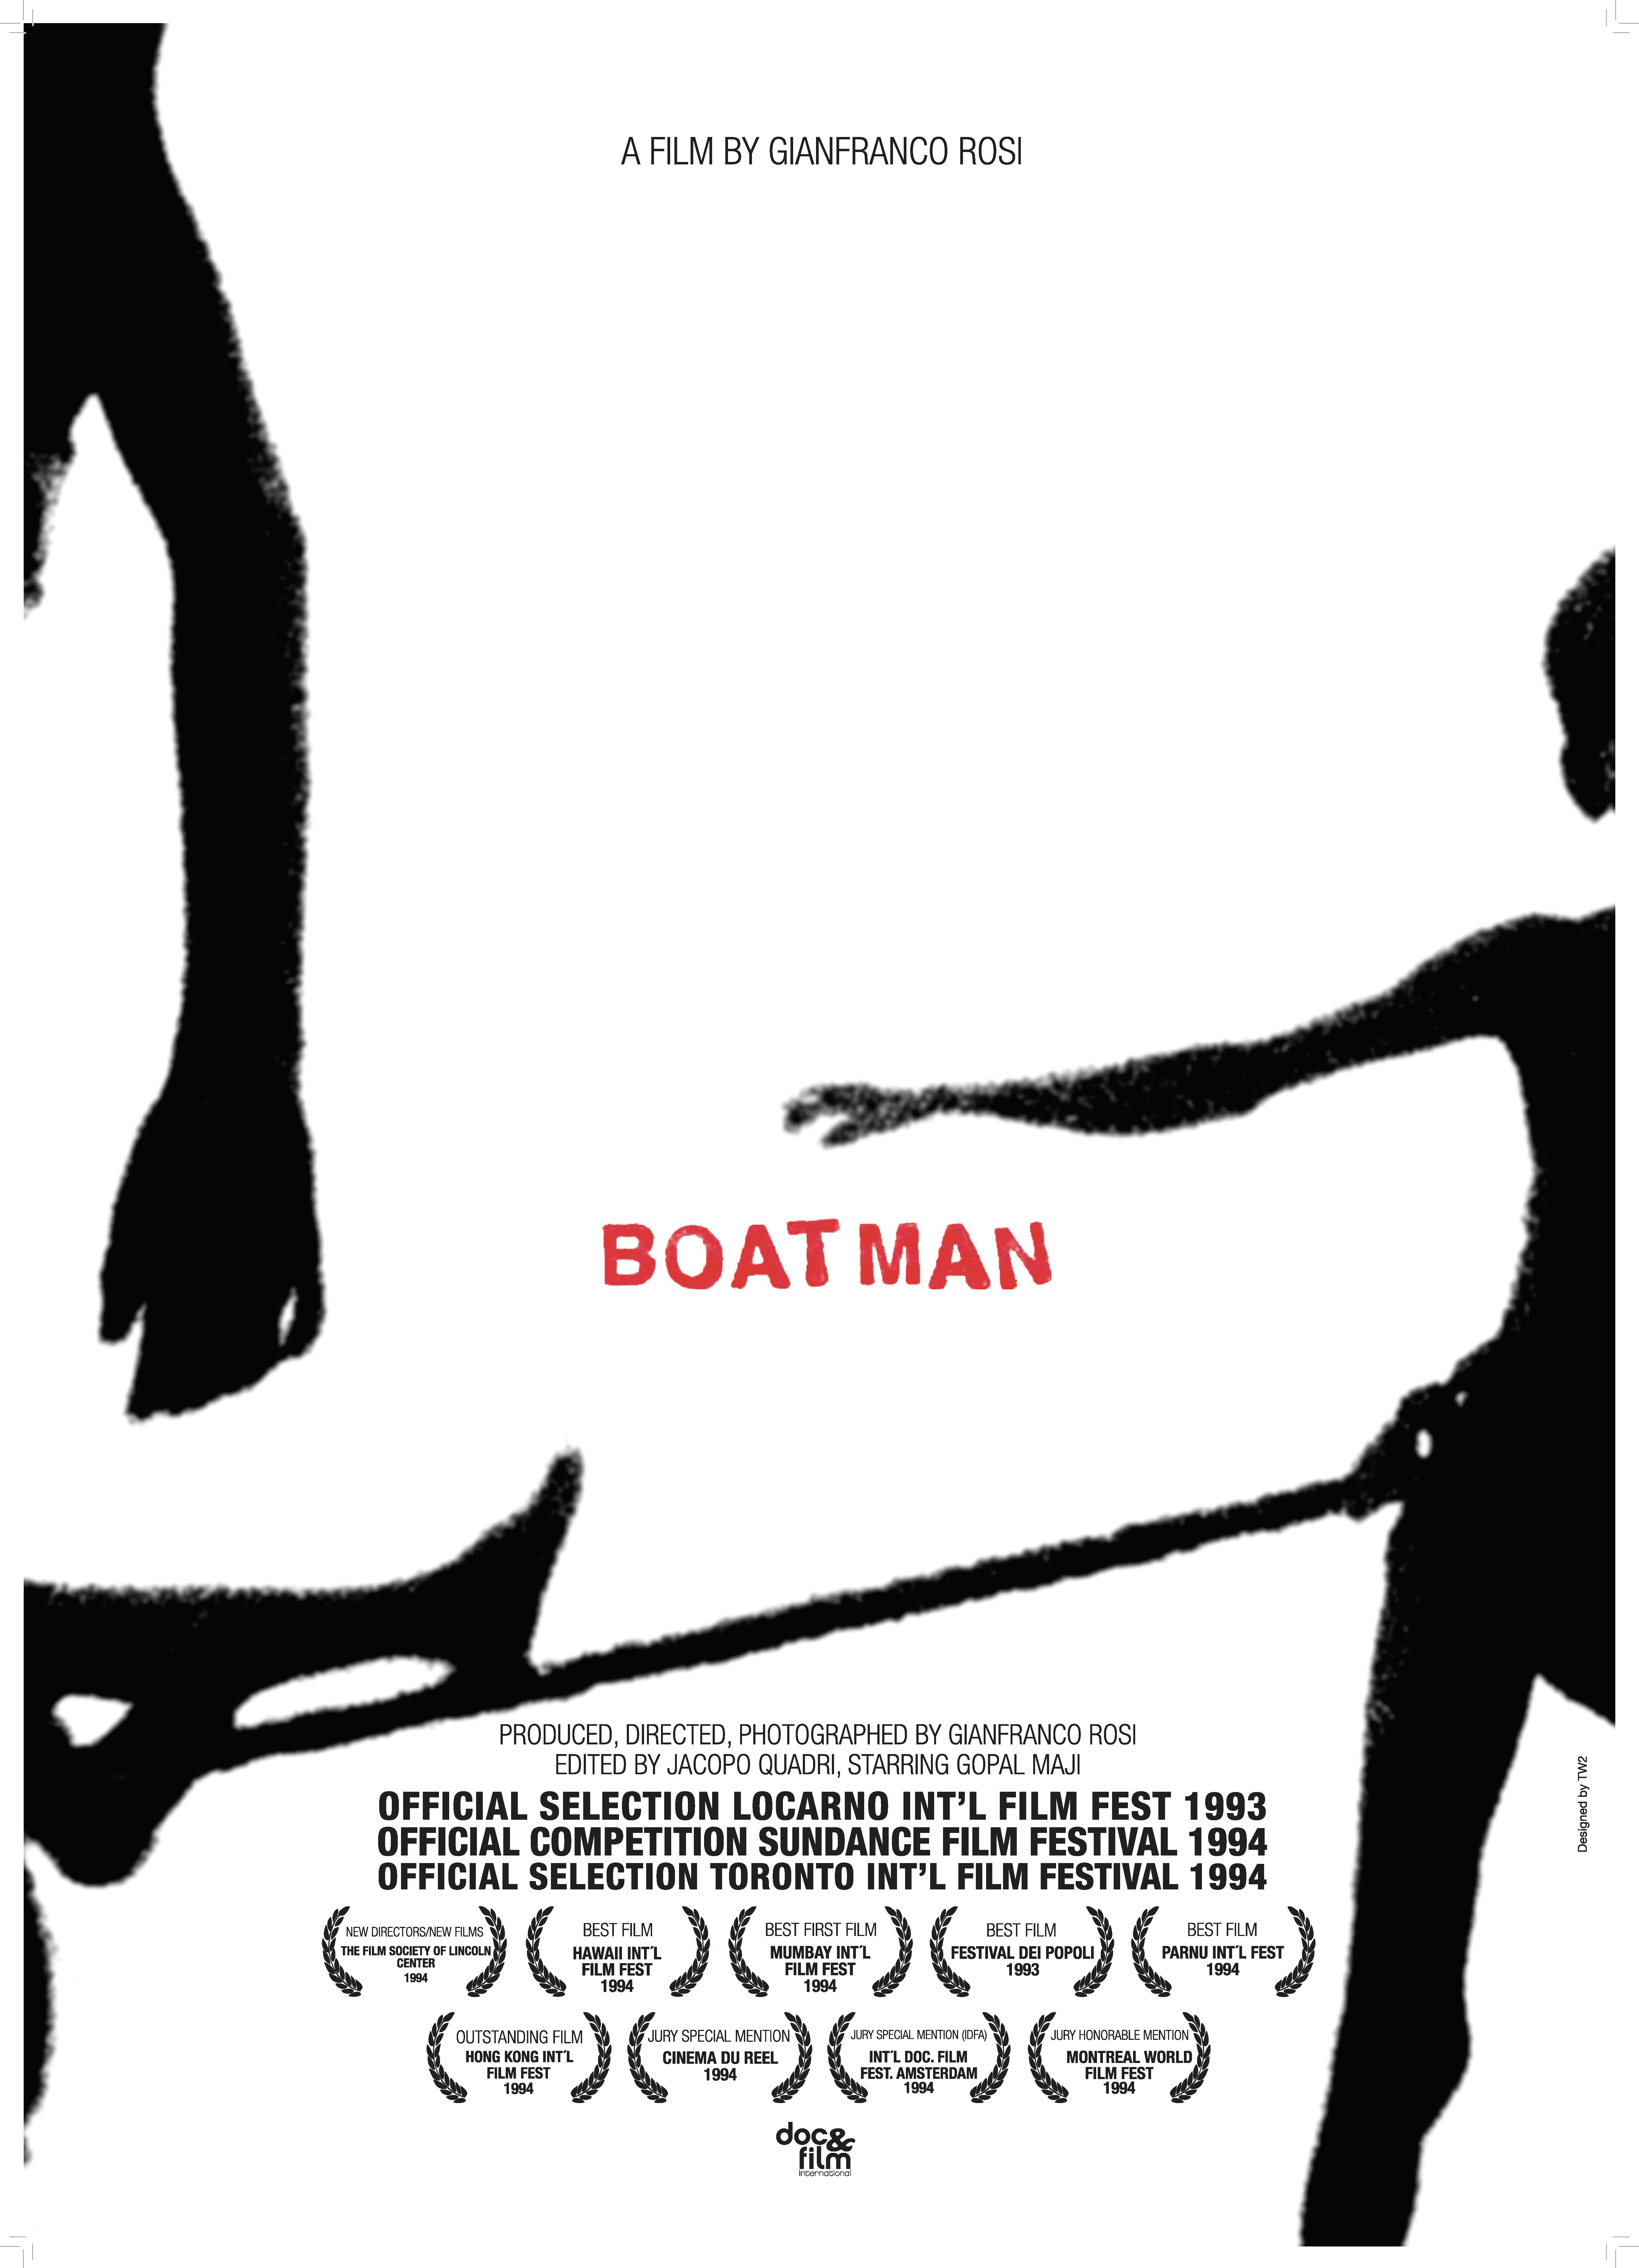 Boatman_Artwork